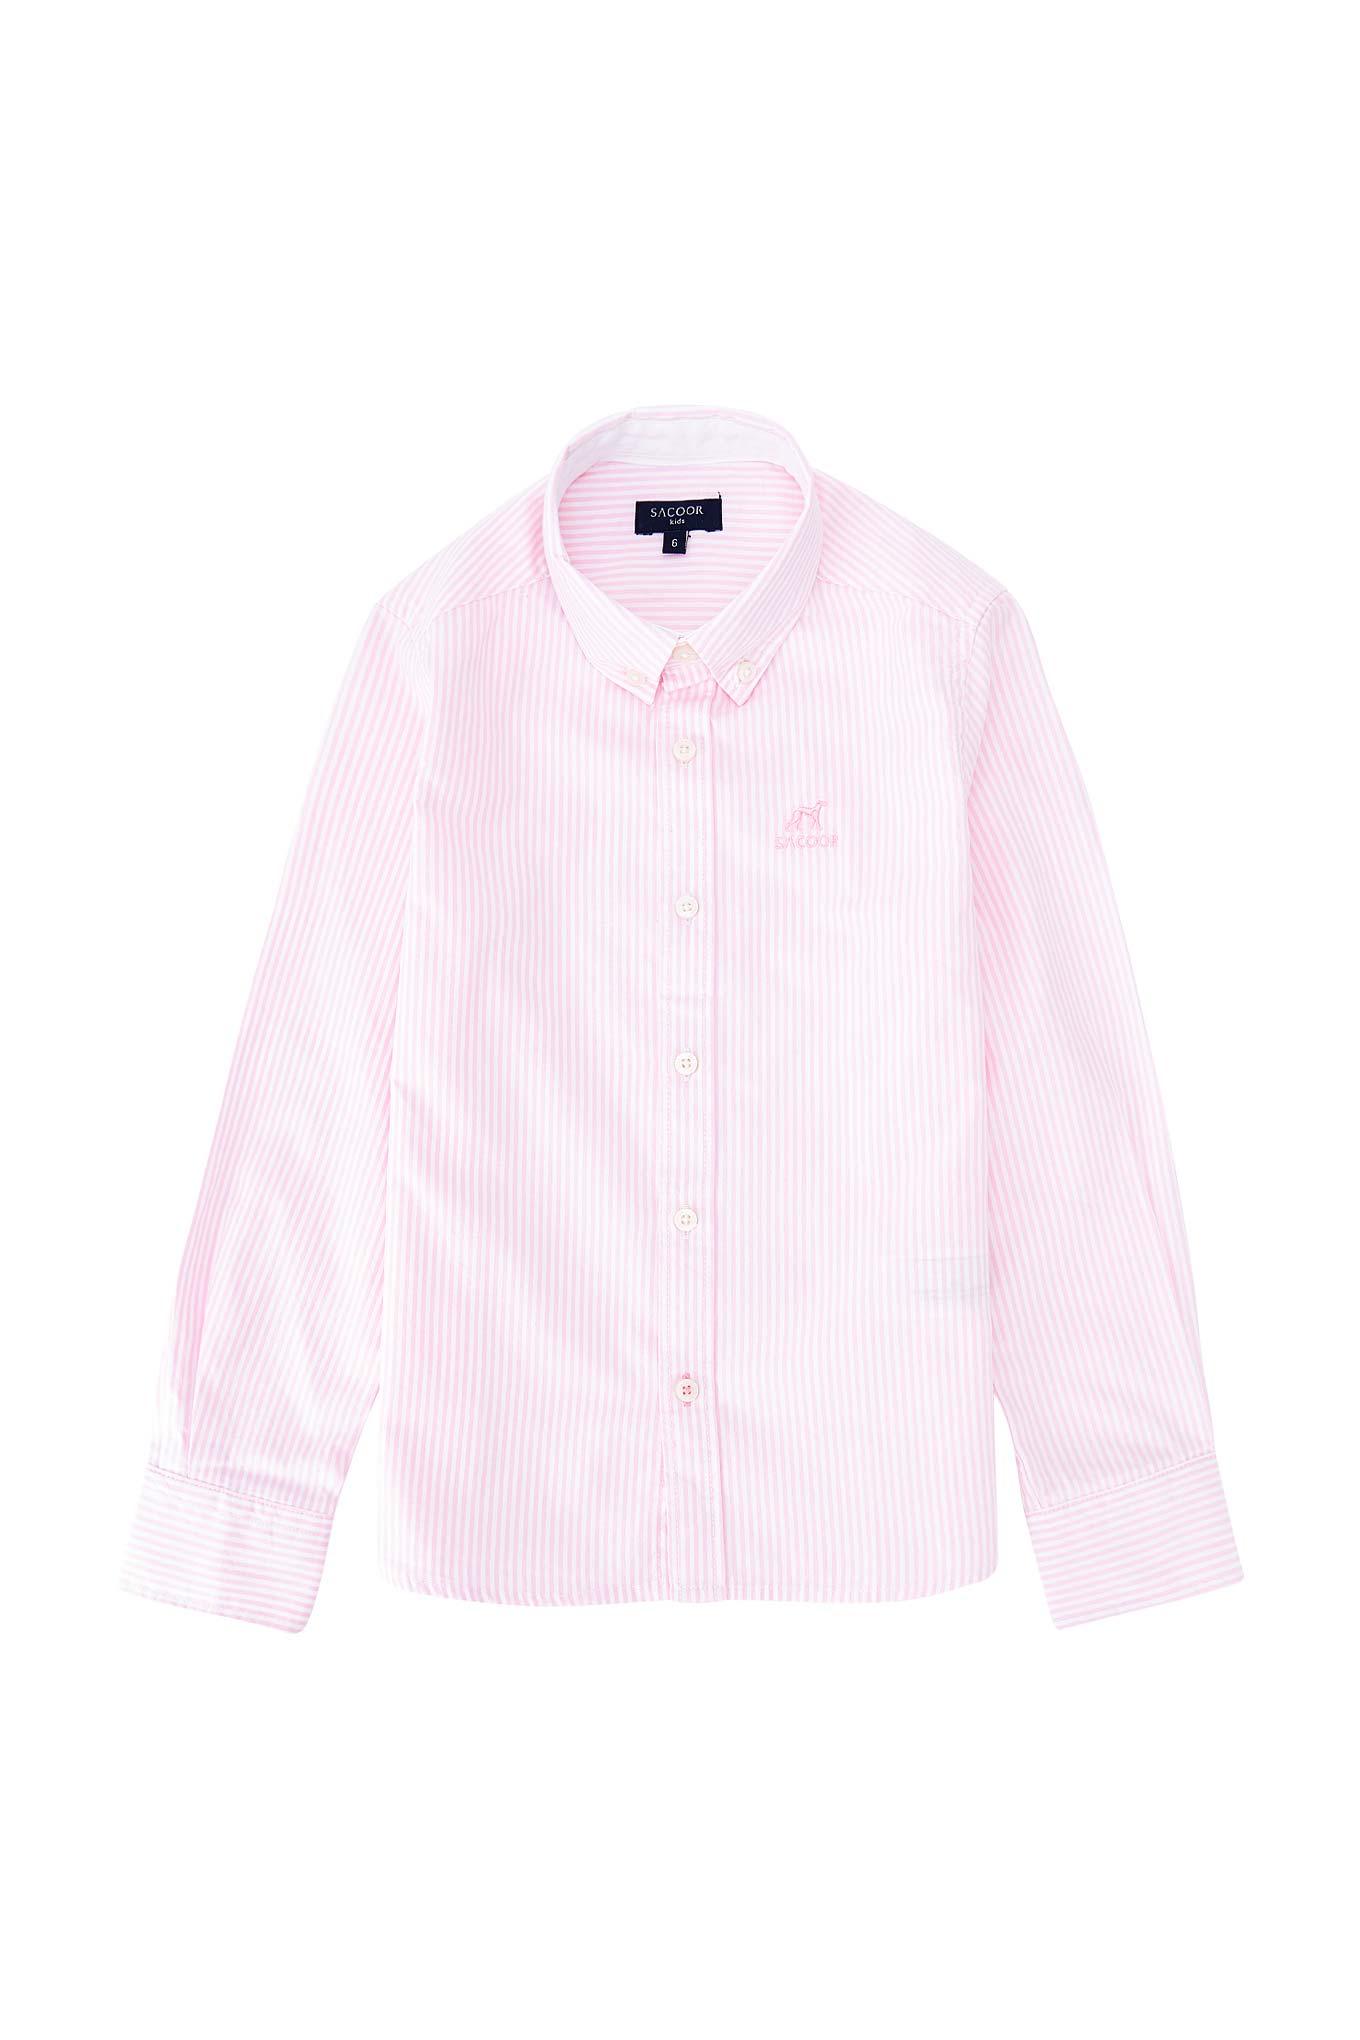 Shirt Pink Casual Boy